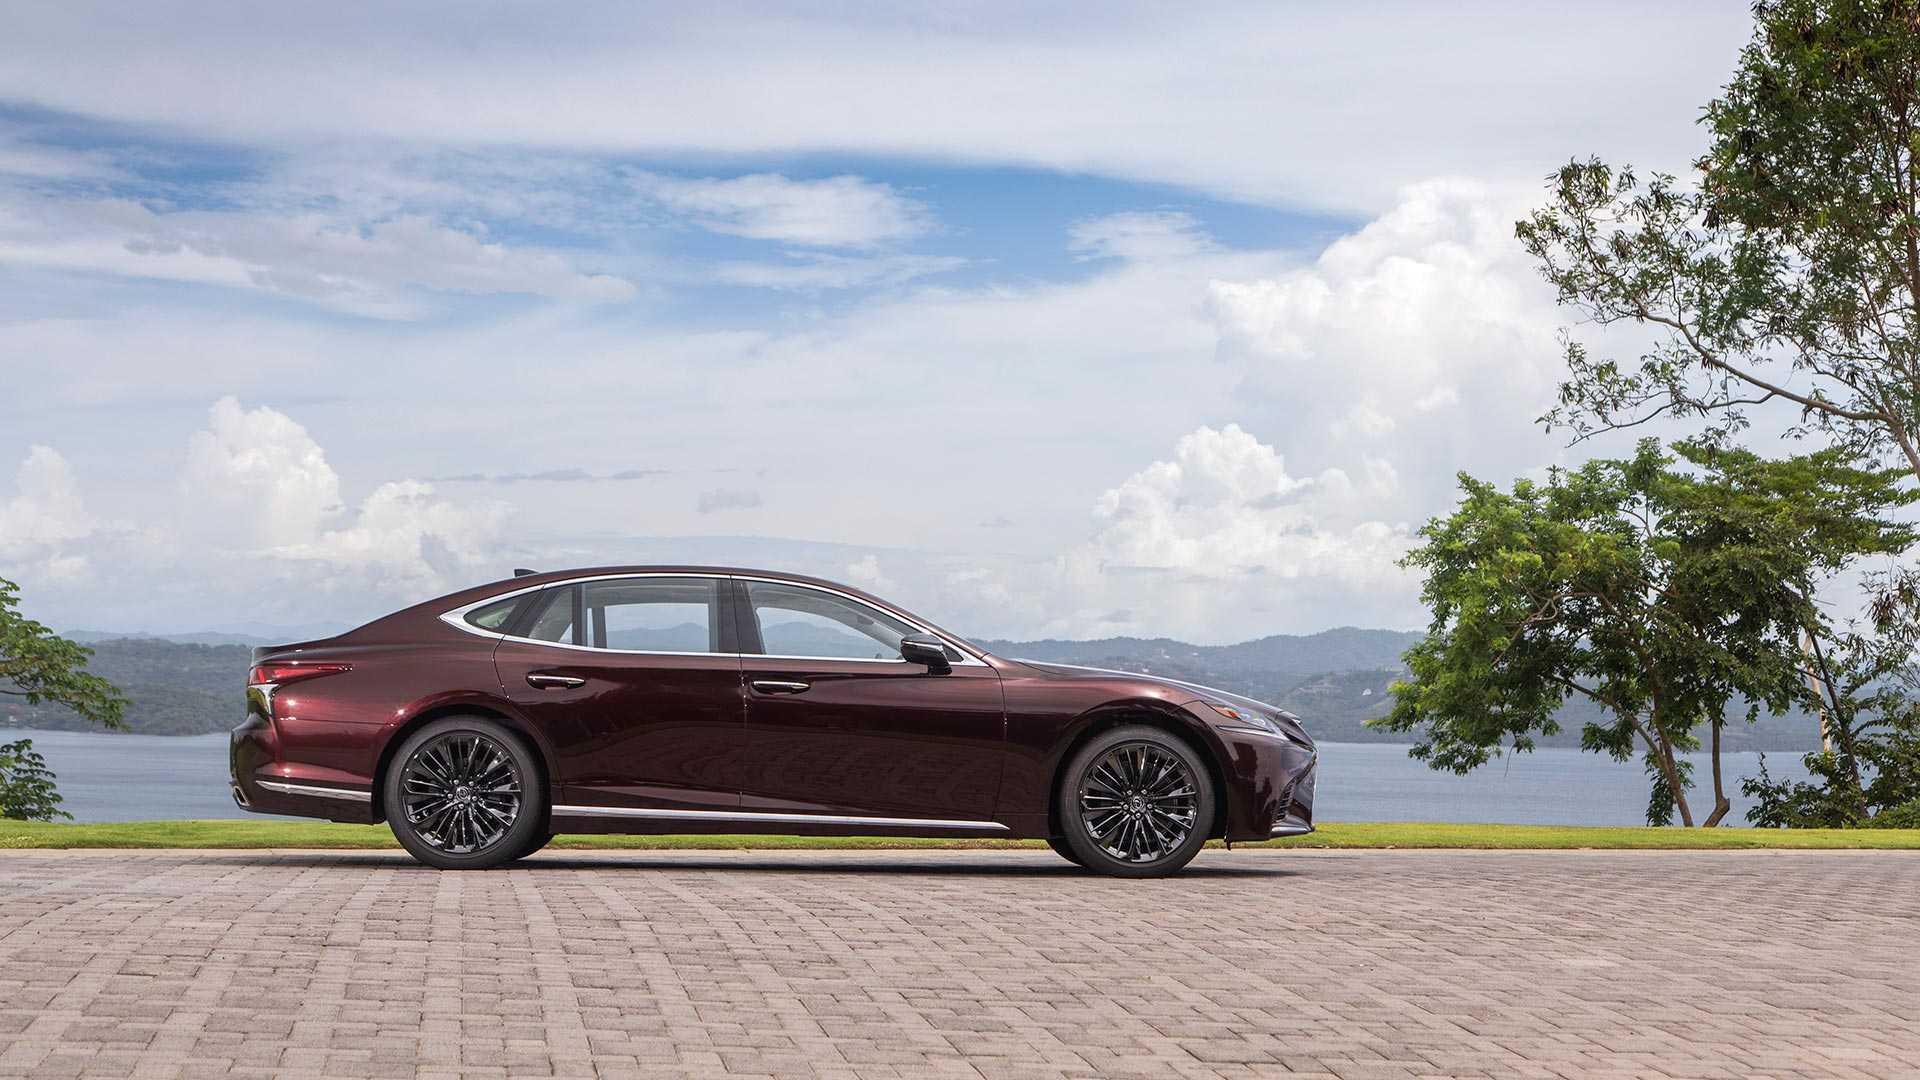 Lexus Ls 500 Inspiration Series Debuts Looking Stylish In